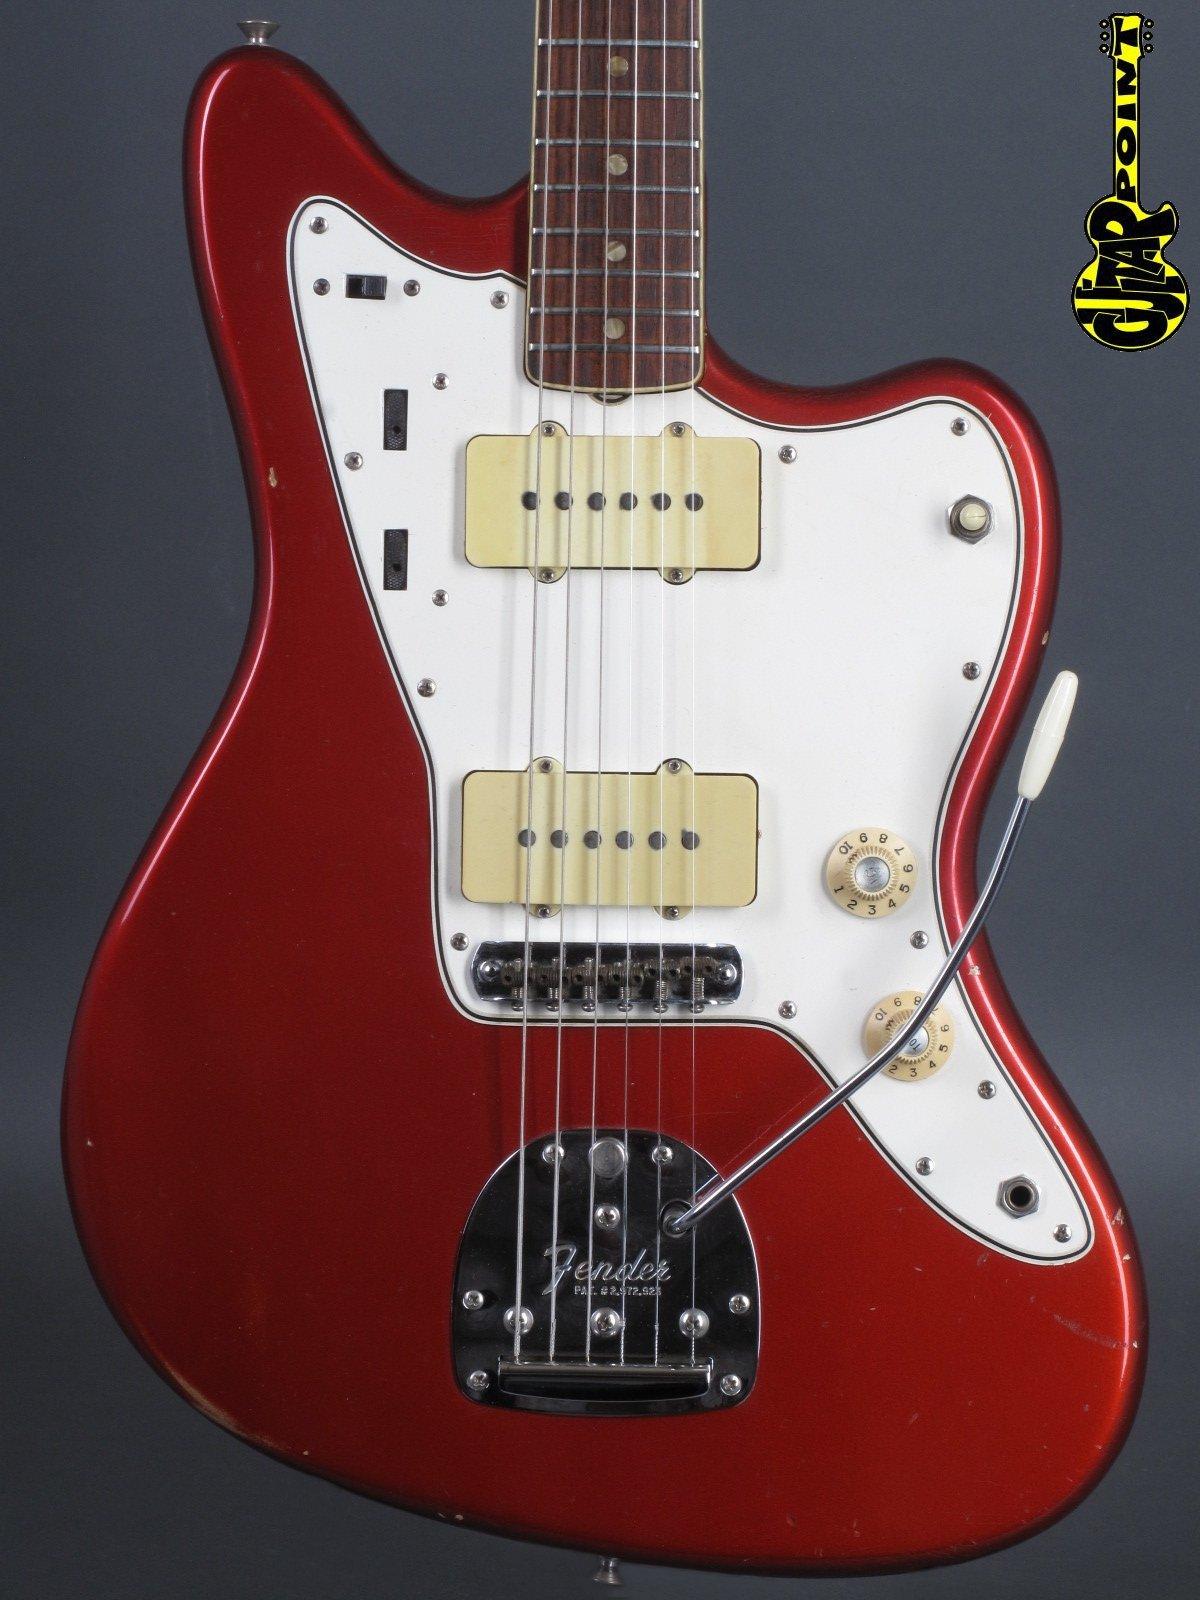 1966 Fender Jazzmaster - Candy Apple Red - white Case